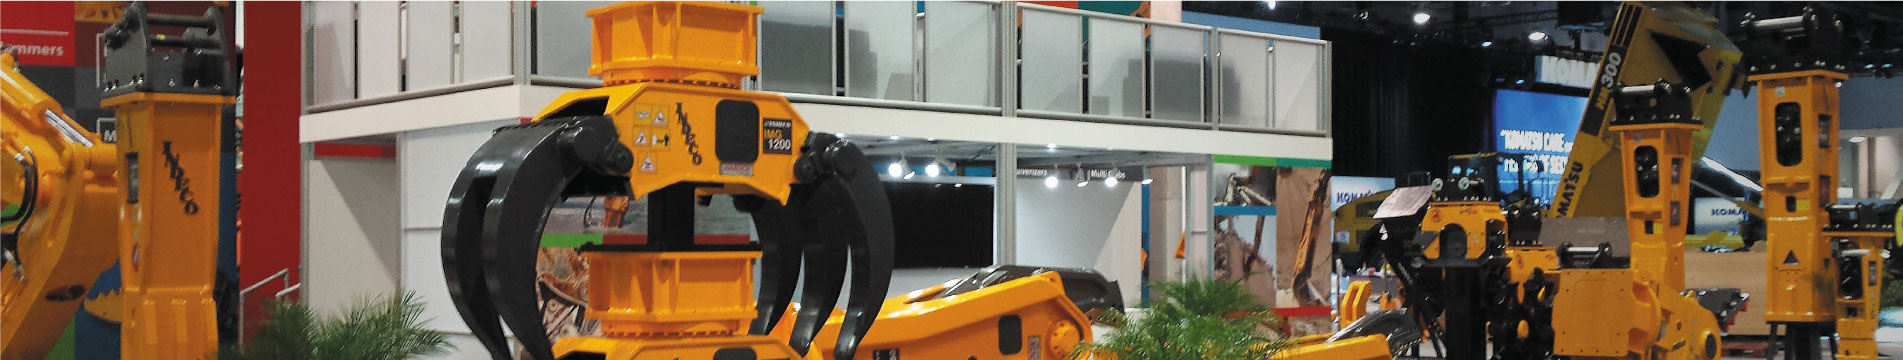 Double Deck Trade Show Booth Rentals for CONEXPO, Las Vegas | DisplayCraft